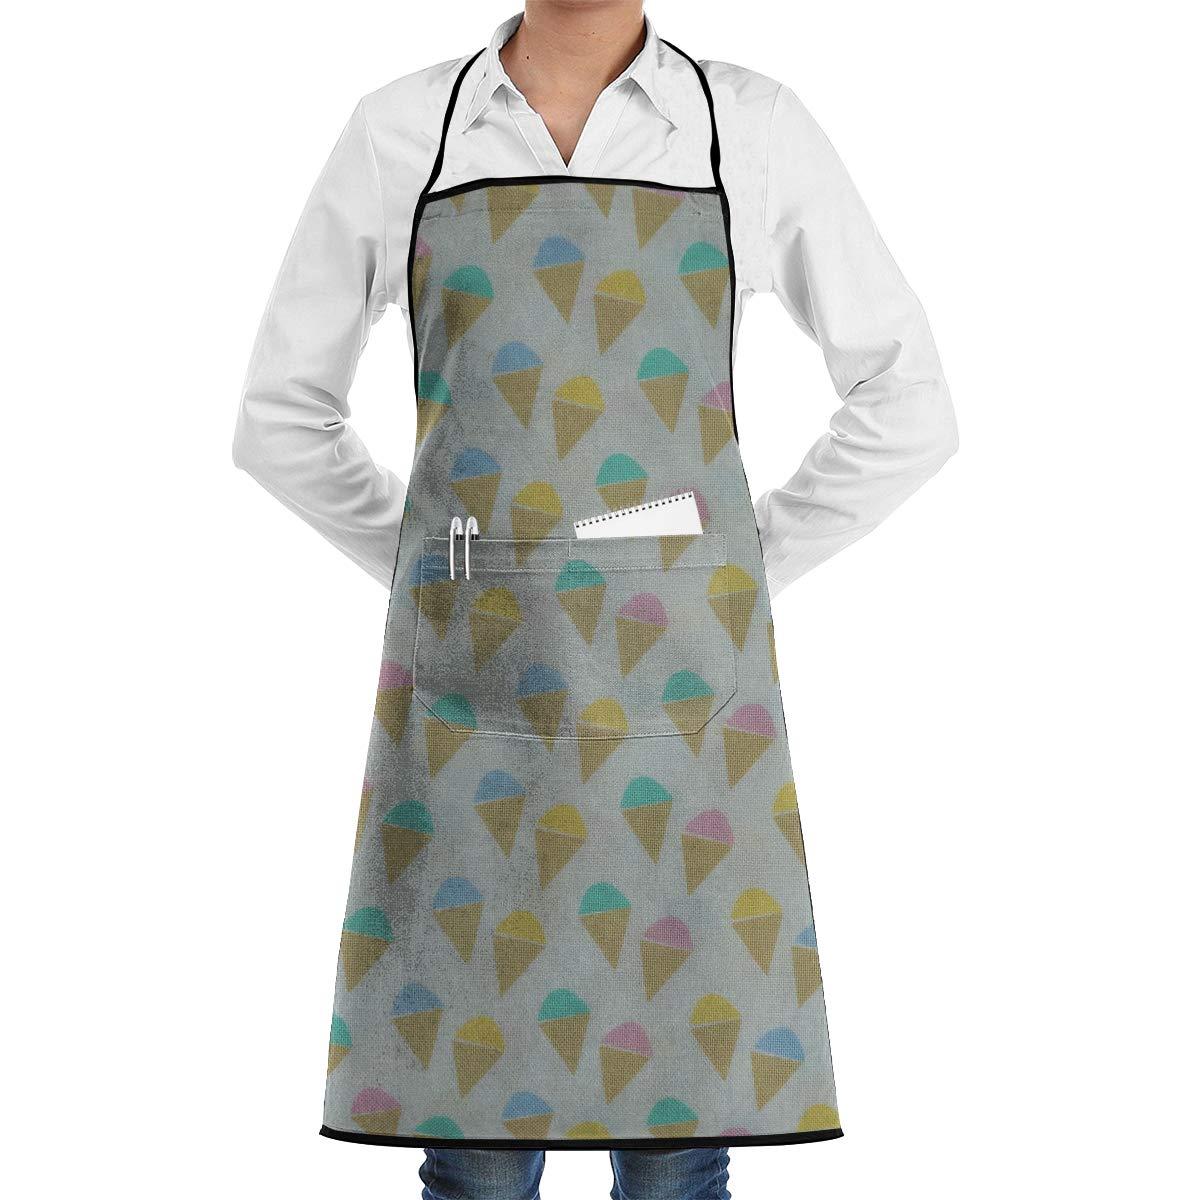 Agilitynoun Ice Cream Pop Sickle Sewing Kitchen Bib Apron Center Kangaroo Pocket Adjustable Tie Home Waterproof